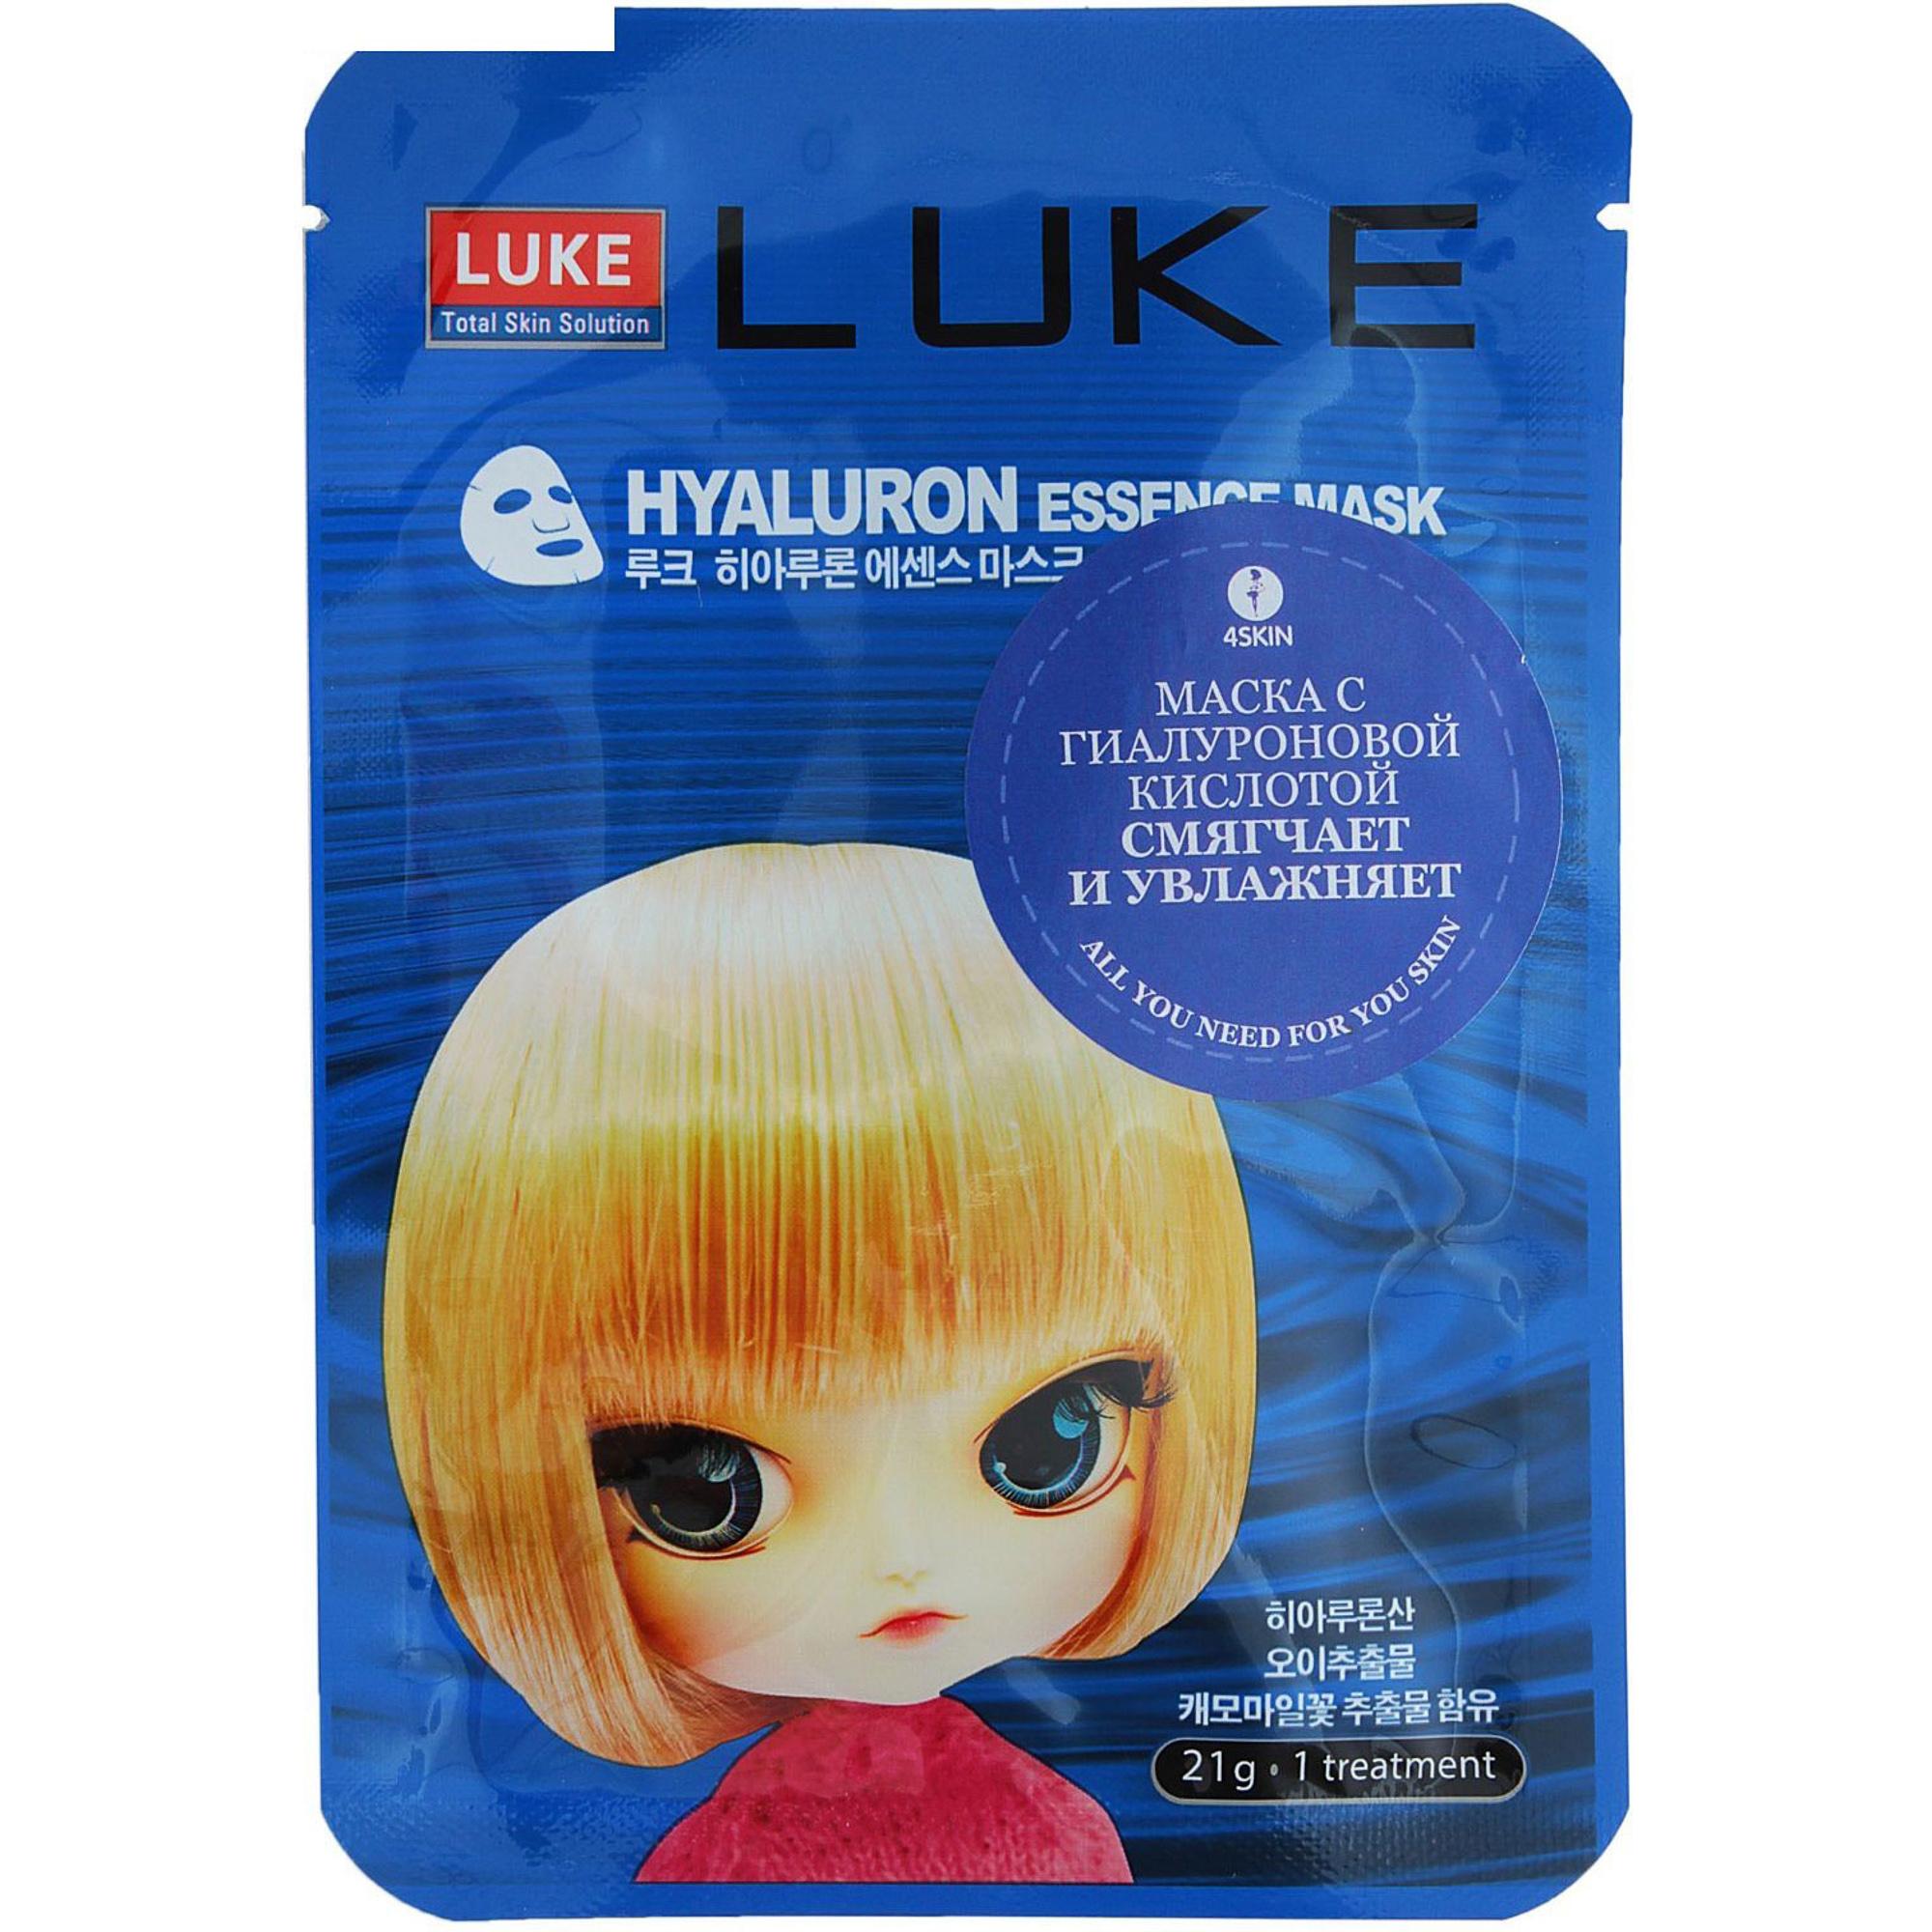 Маска для лица Luke Hyaluron Essence Mask с гиалуроновой кислотой 21 г.